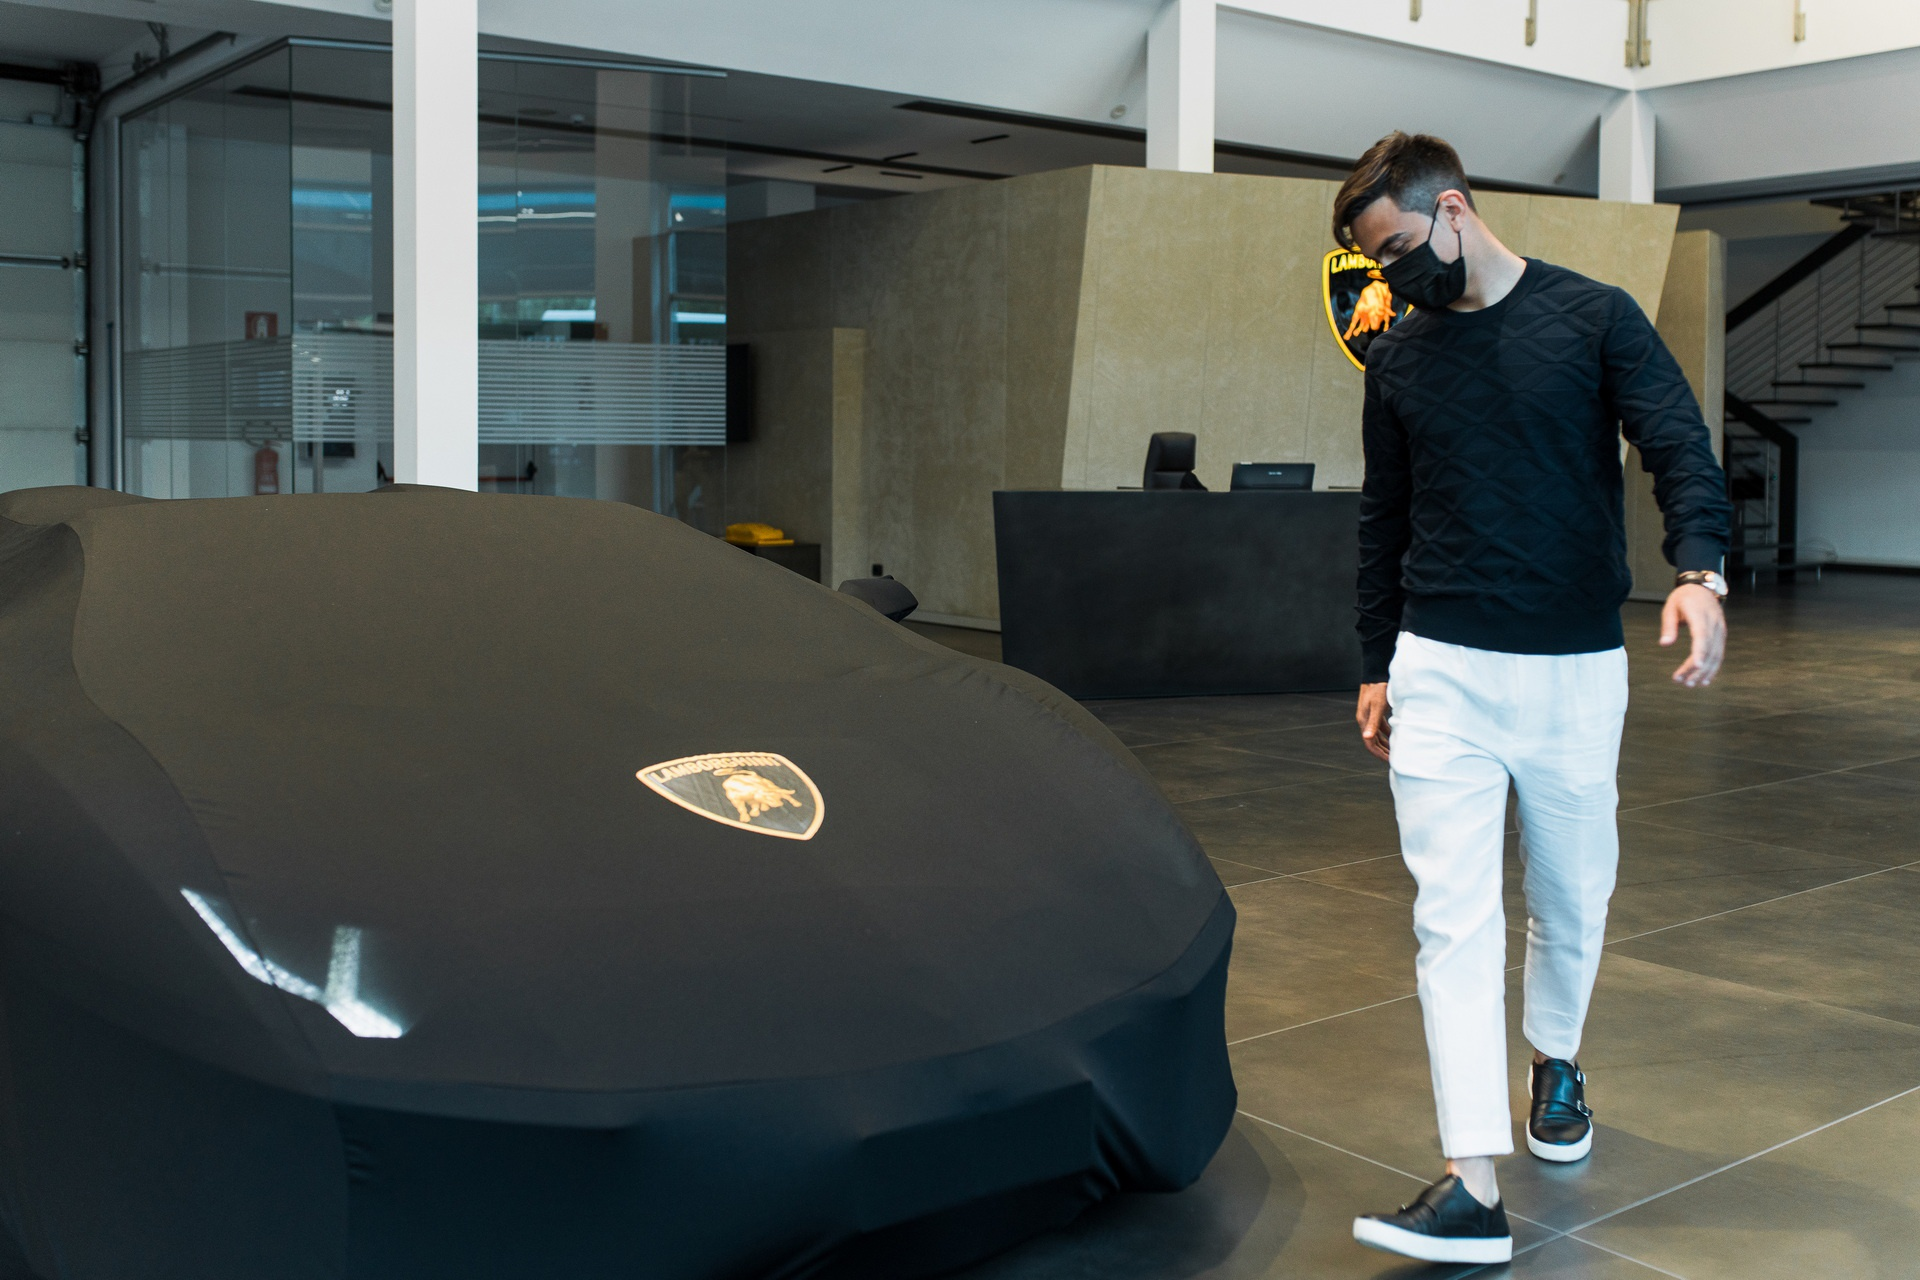 Chi tiết siêu xe Lamborghini Aventador S Roadster của Paulo Dybala - Ảnh 1.